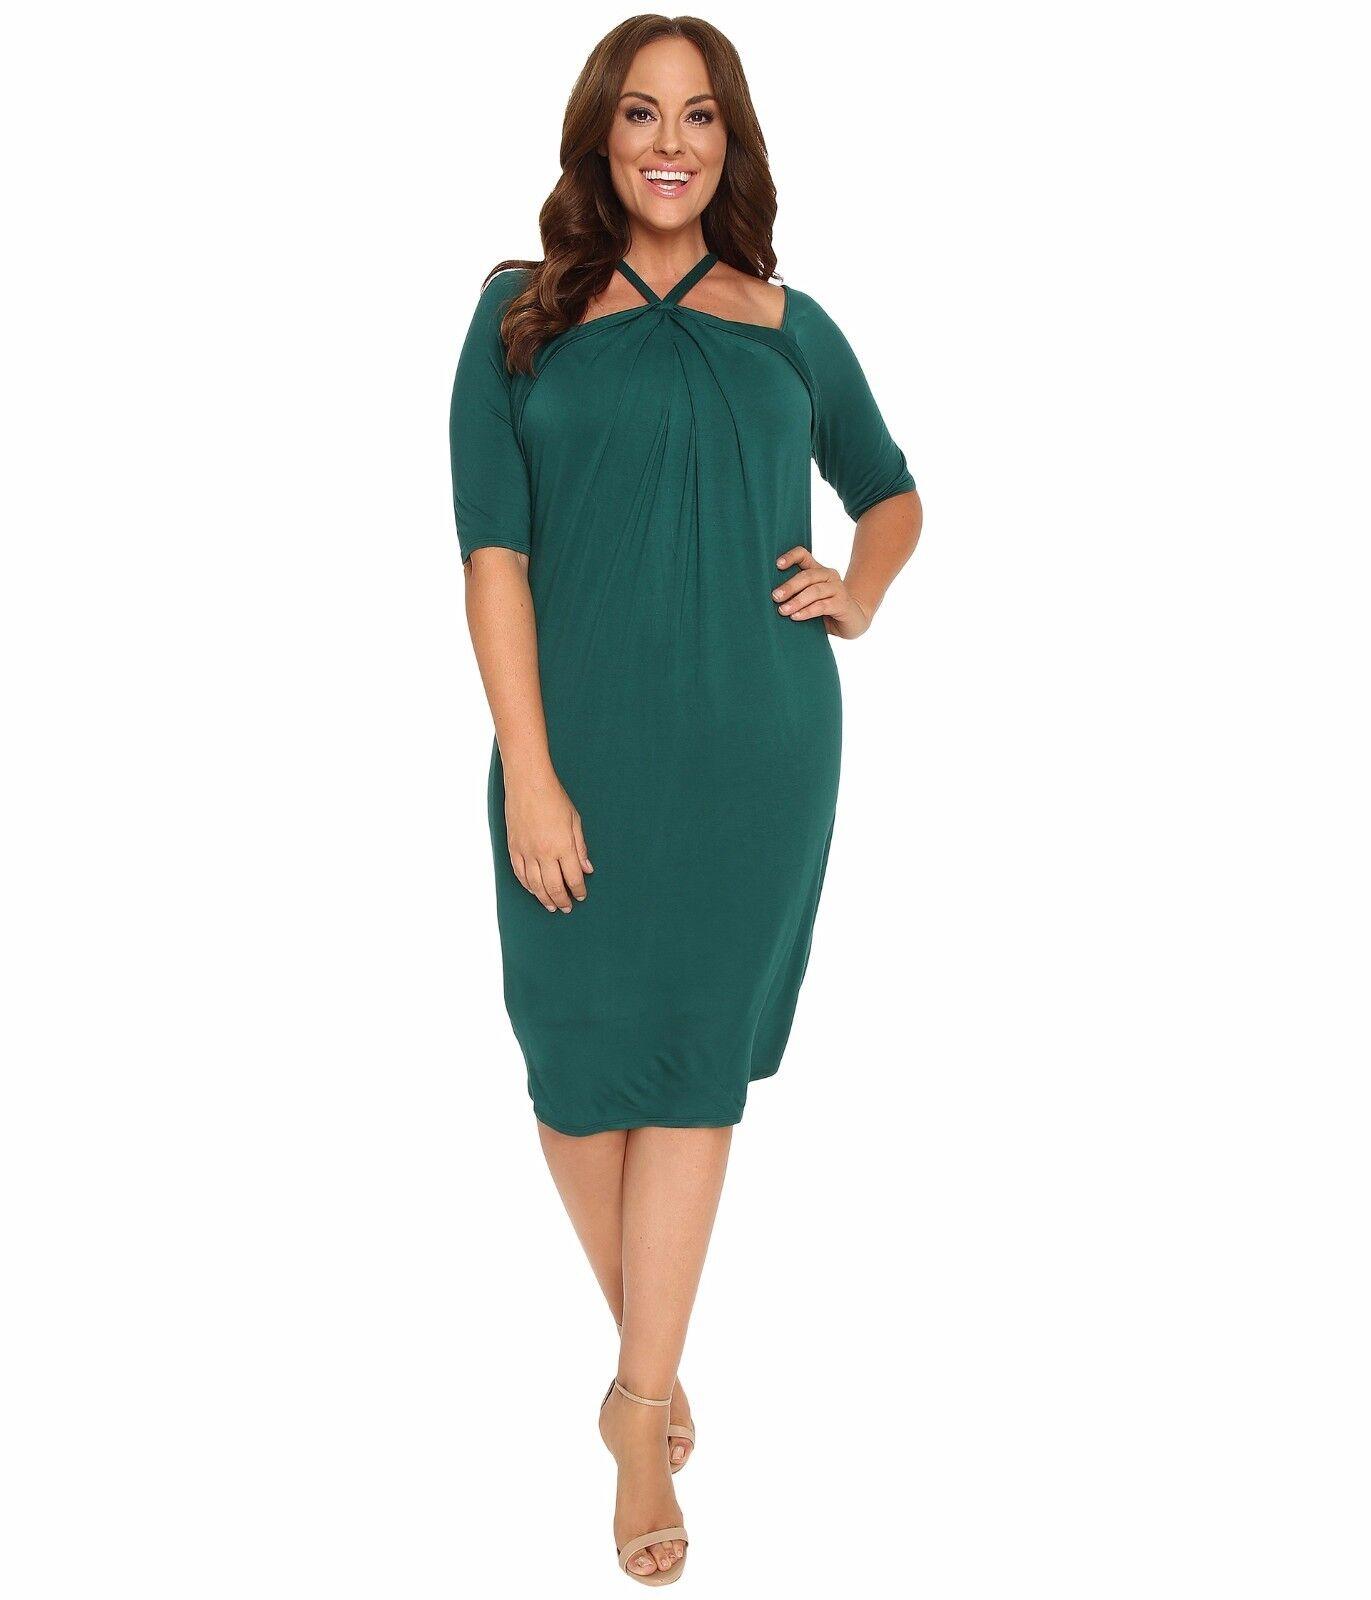 NWT Authentic Kiyonna Destination Draped Dress in Emerald Isle, 2X, 3X